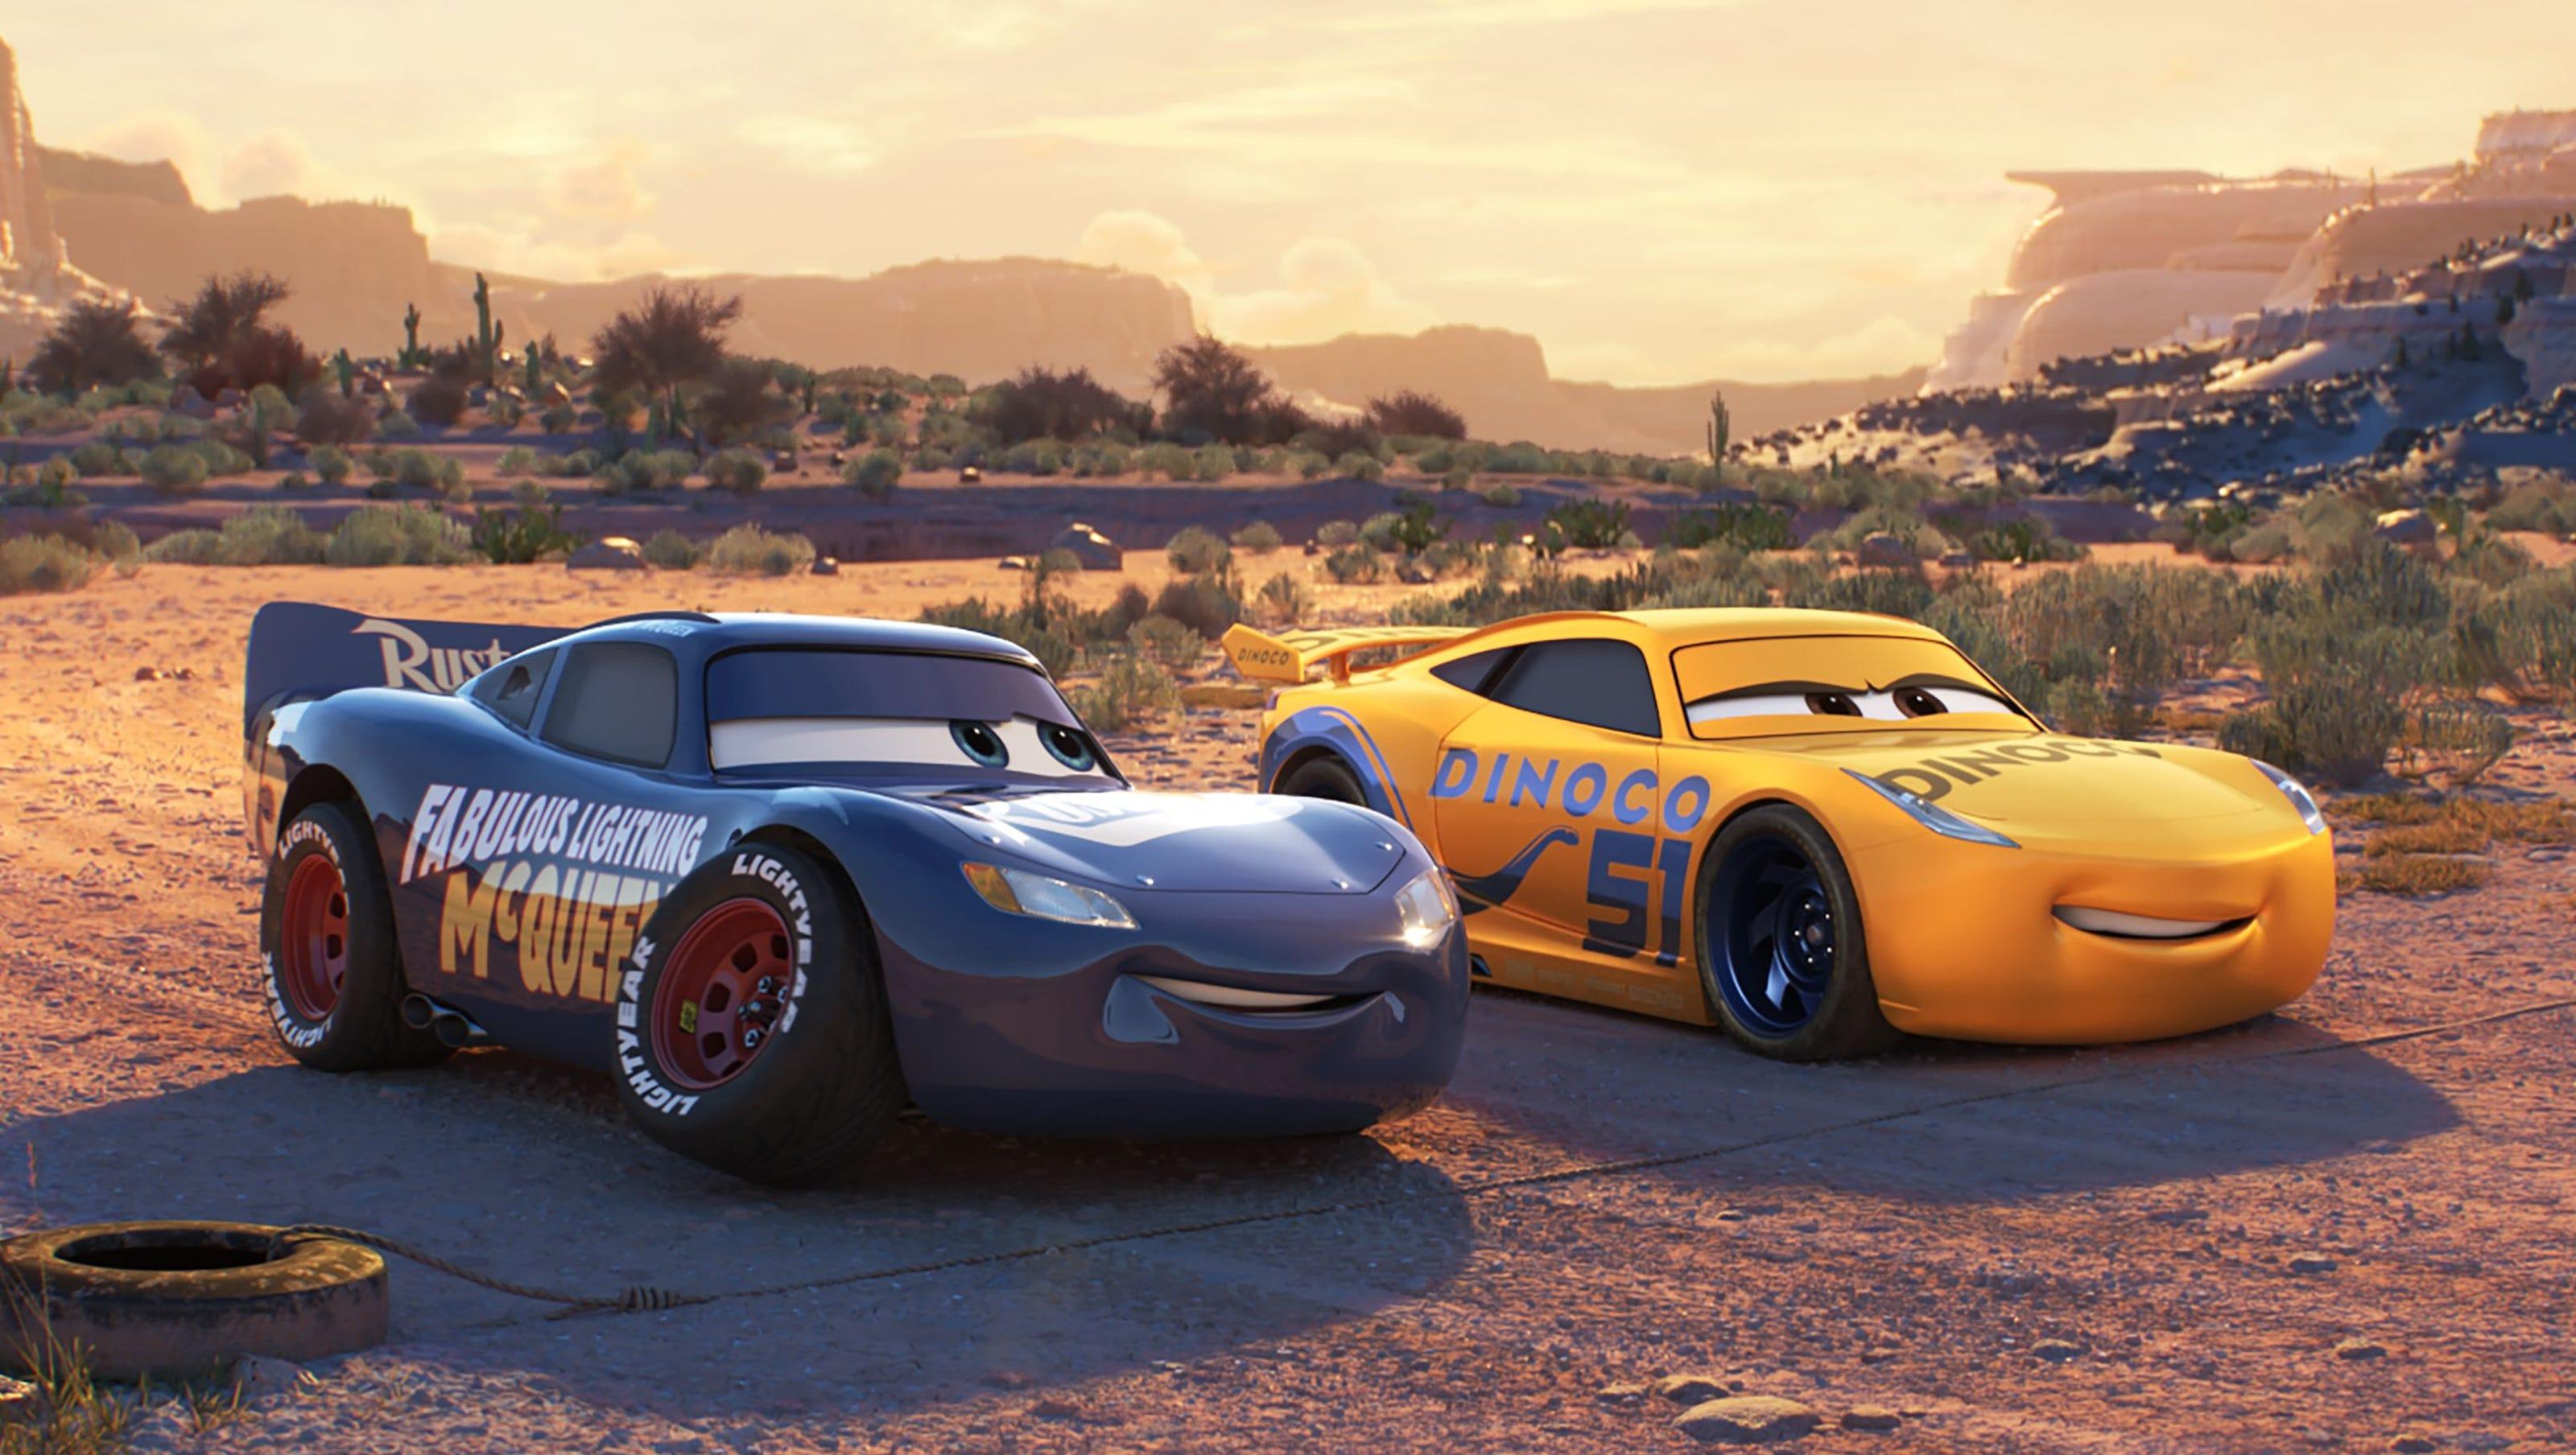 6 Door Truck >> 'Cars 3': Why Lightning McQueen got a new paint job (spoilers)